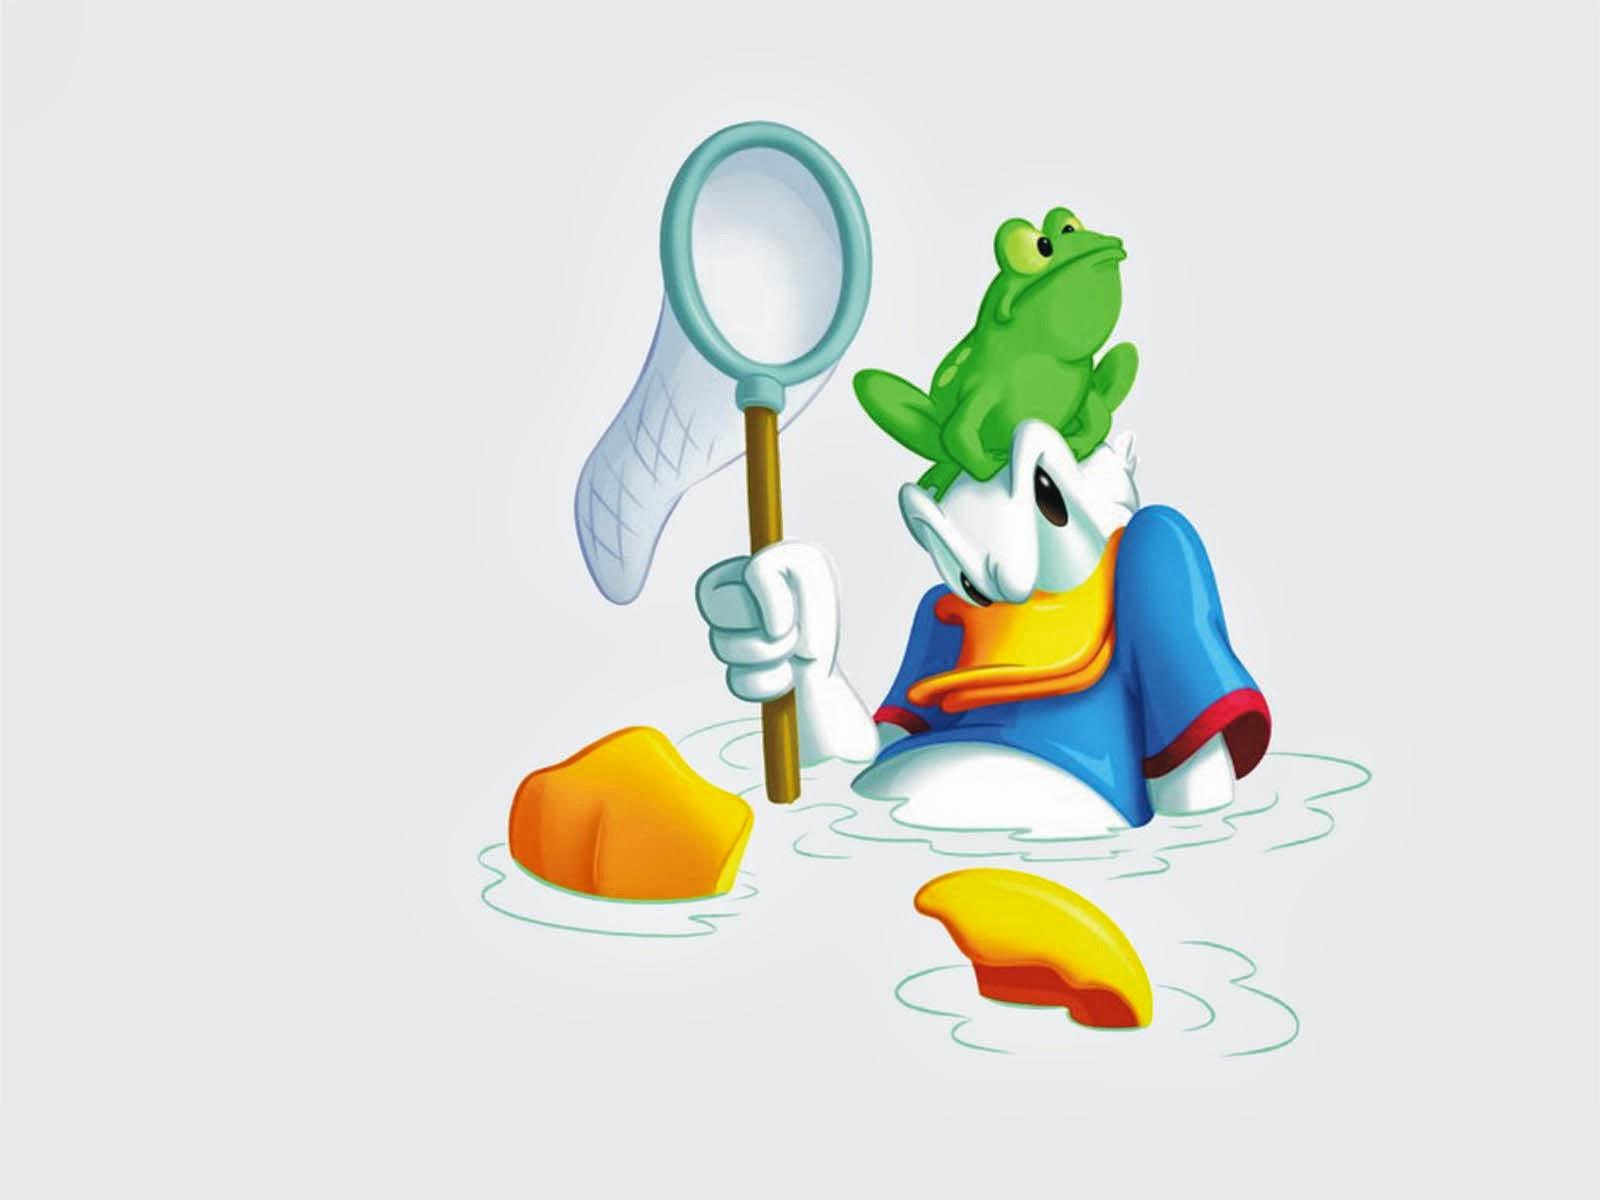 Original Artwork Disneys Donald Duck Acrylic Painting x